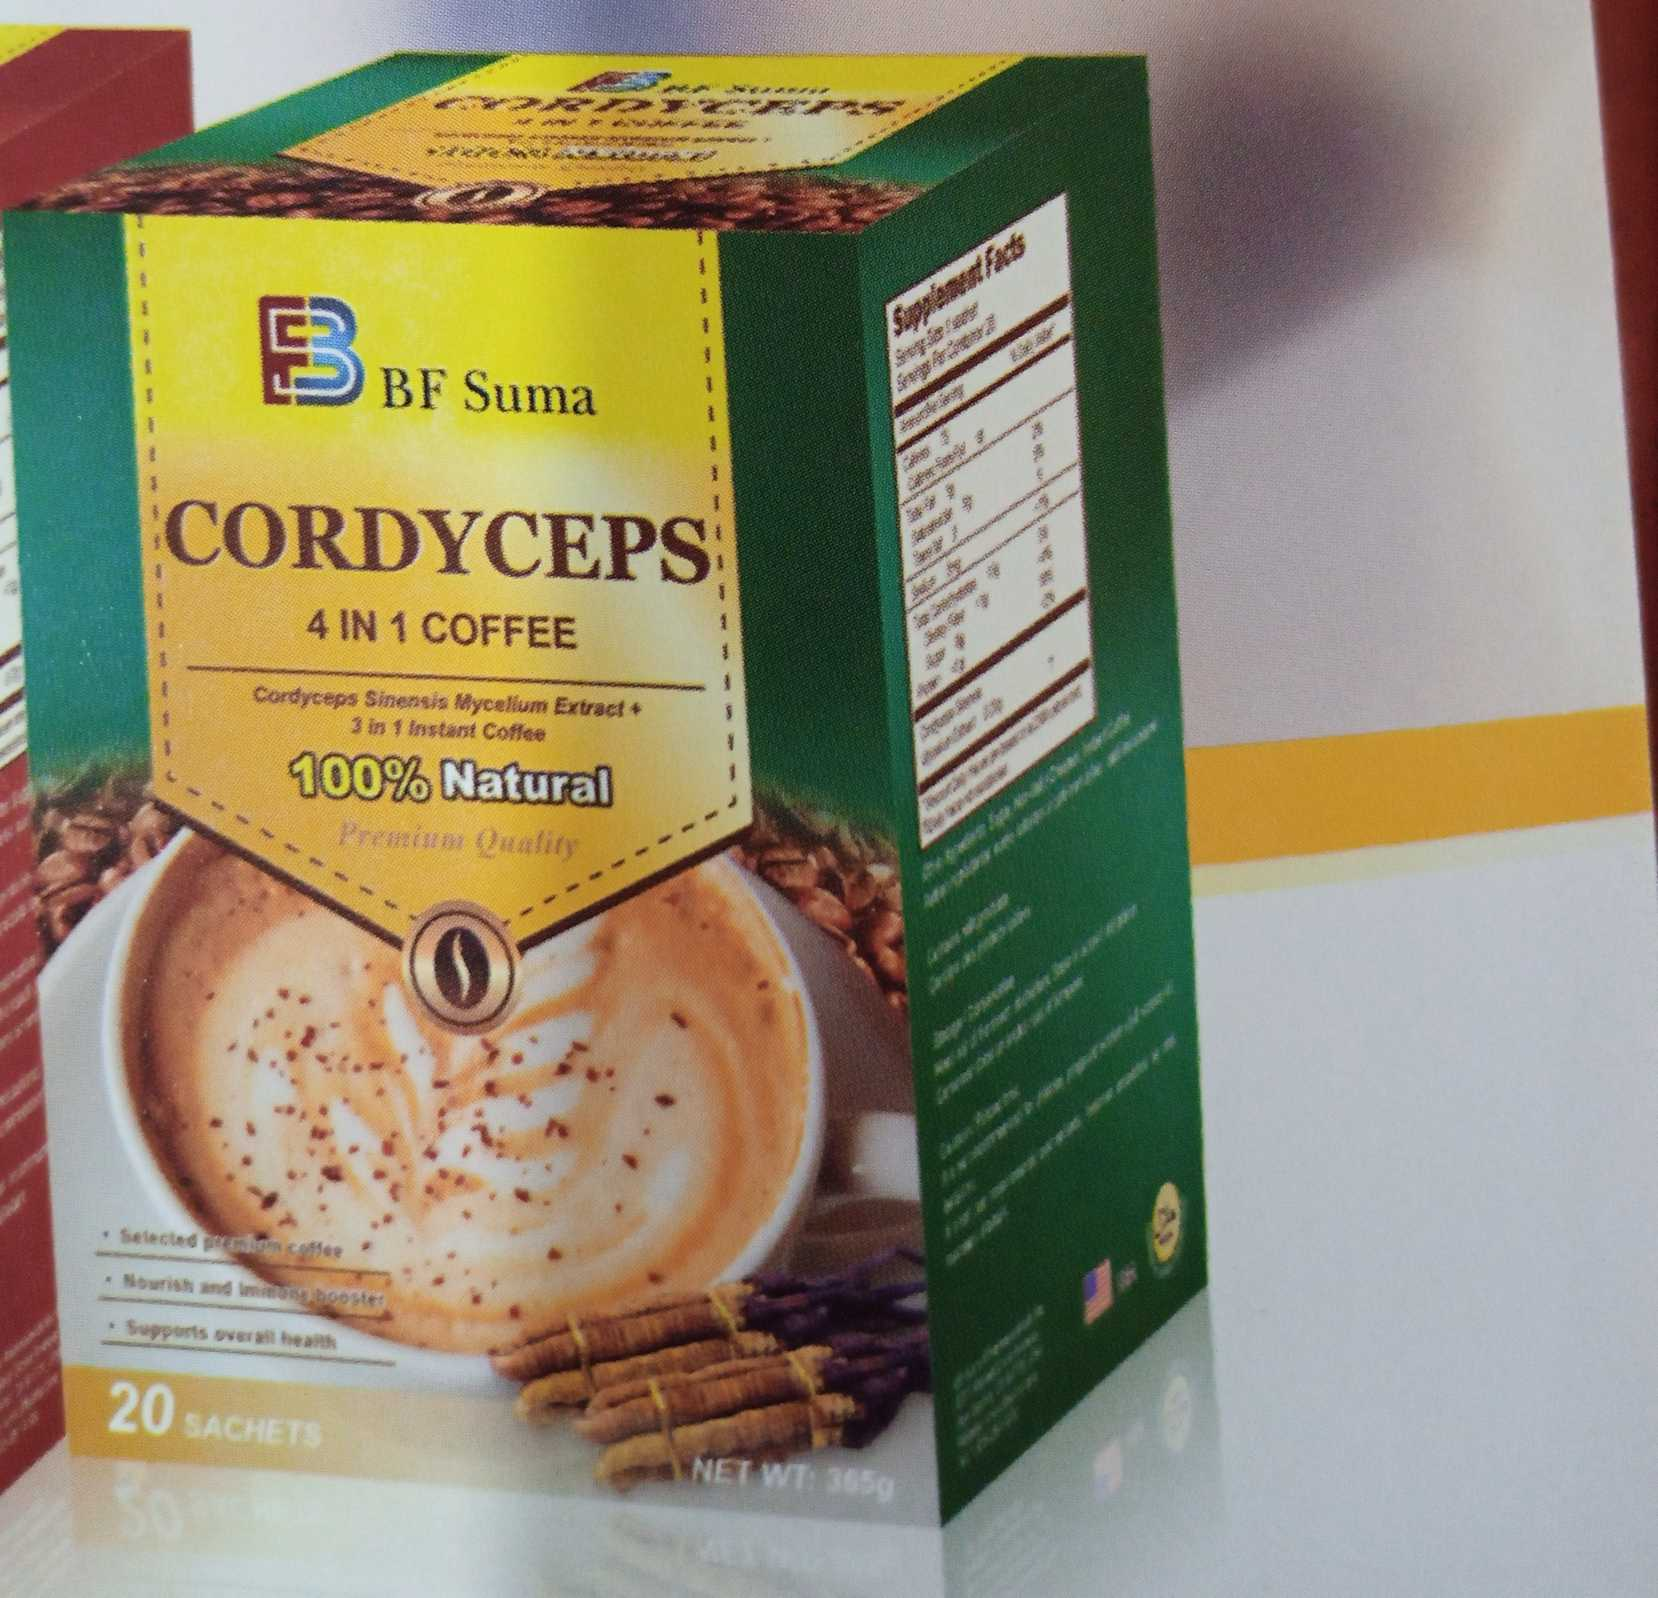 BF SUMA 4 in 1 CORDYCEPS COFFEE